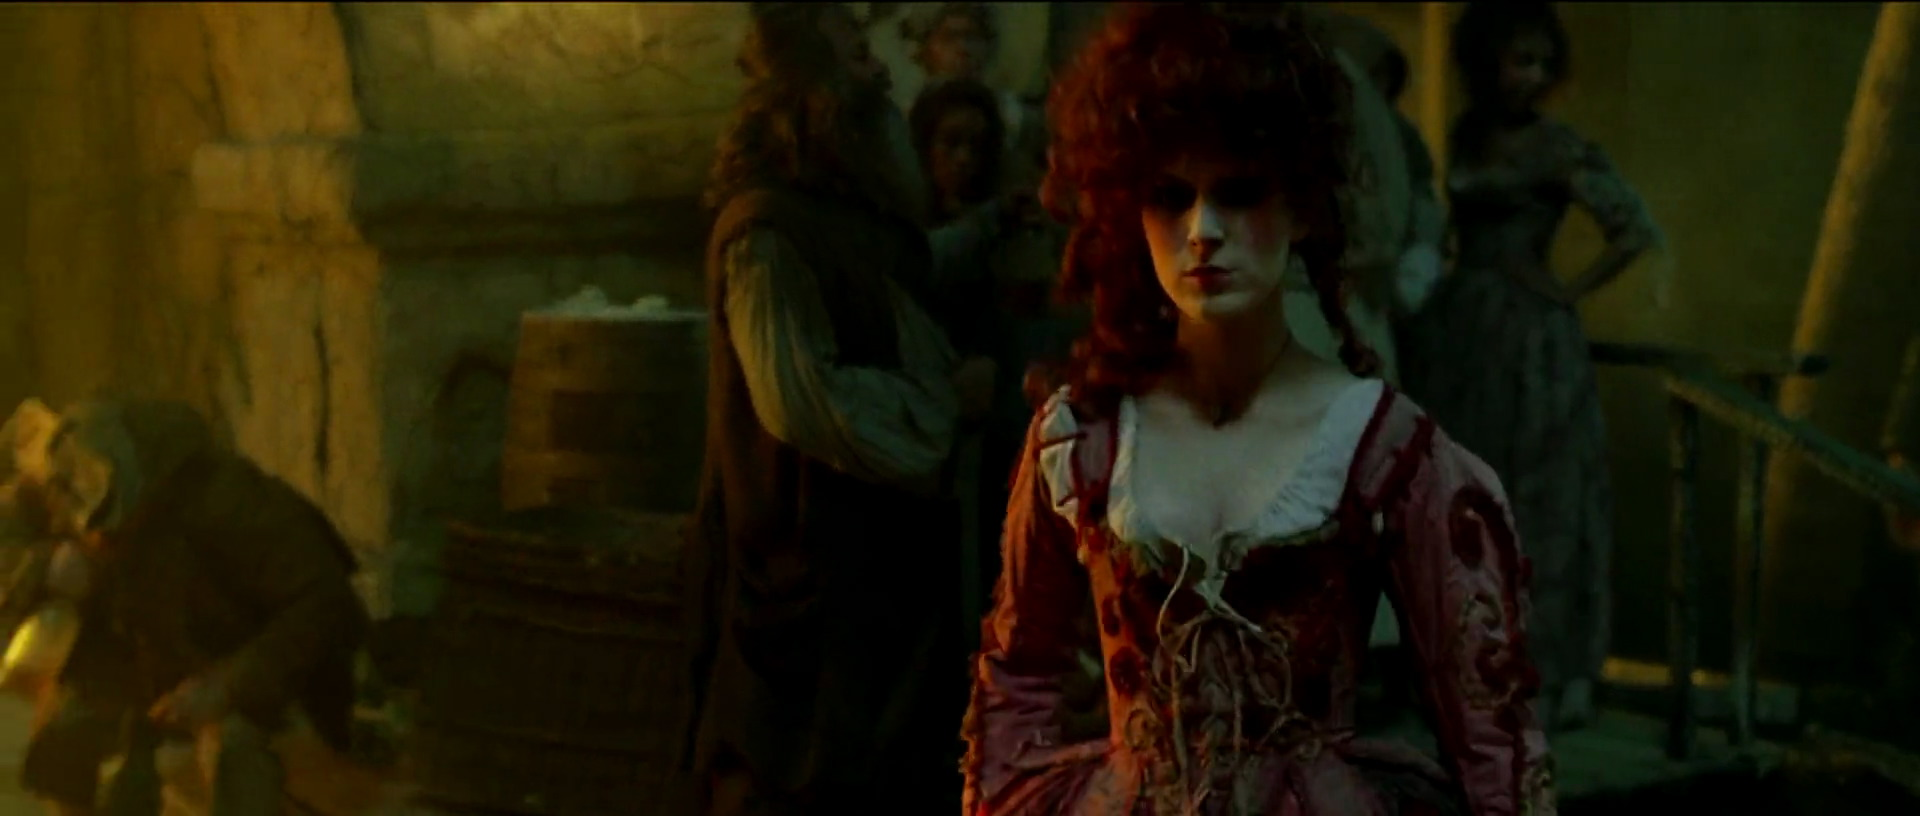 scarlett personnage pirate caraibes malediction black pearl disney character caribbean curse